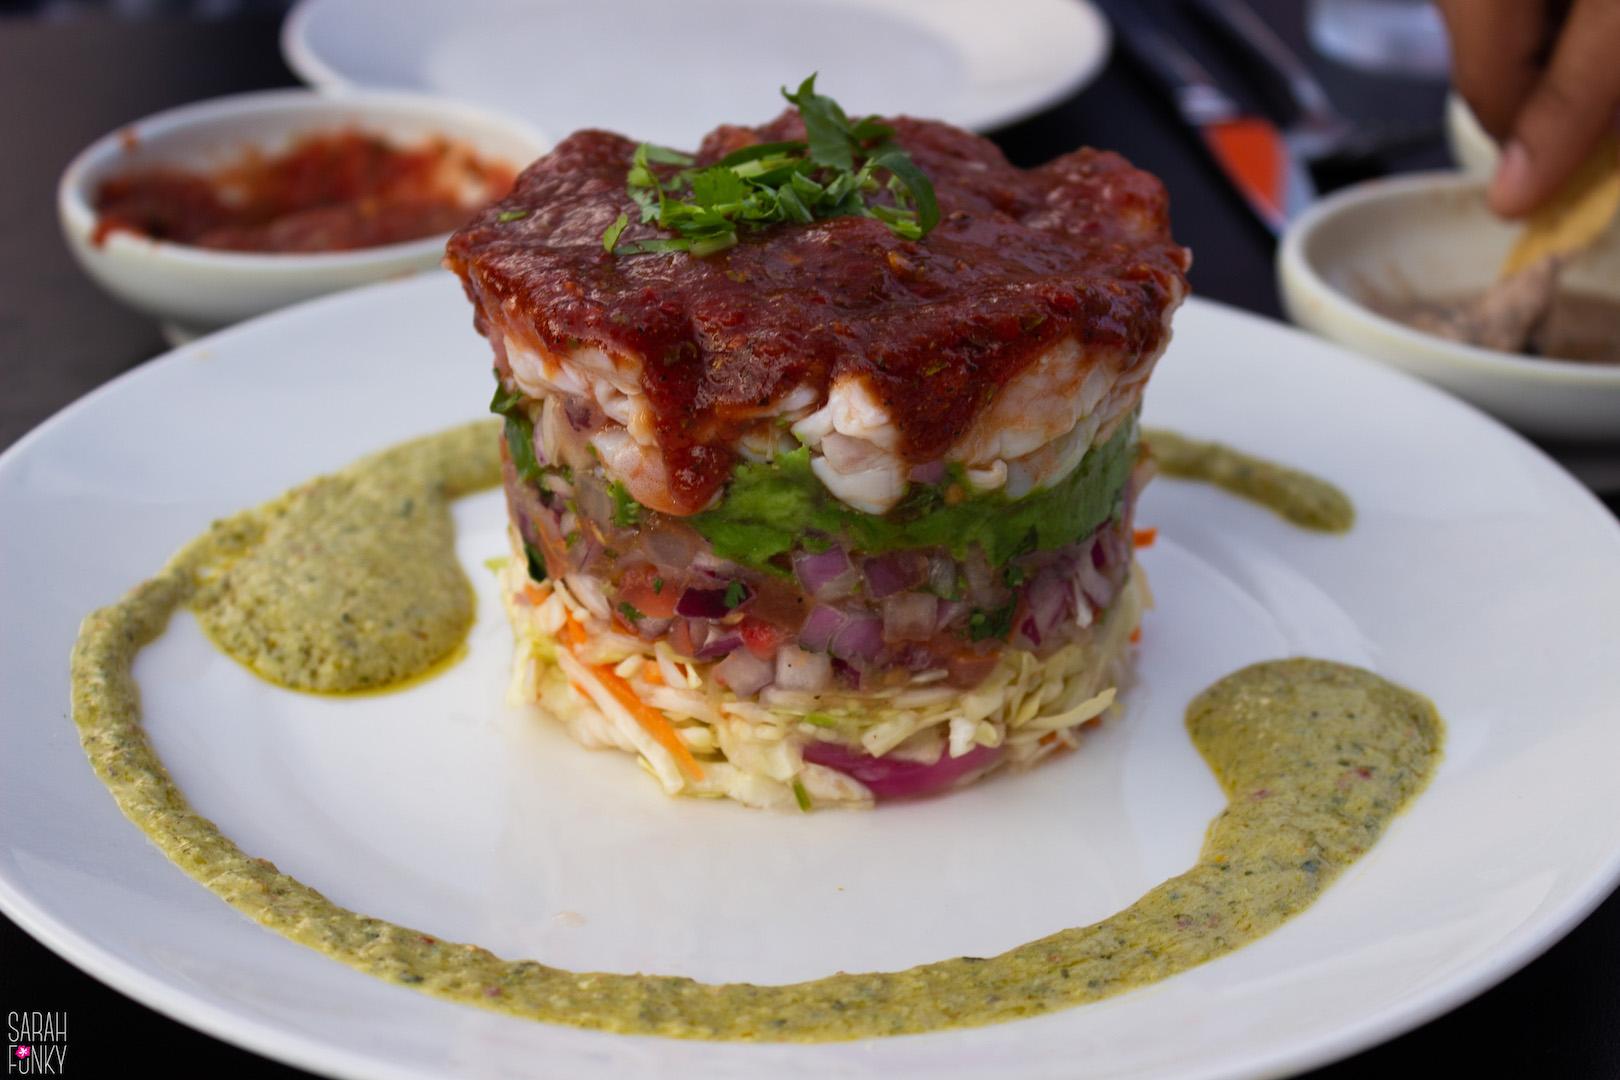 Dallas Texas Restaurants Bars SarahFunky (5 of 8) copy.jpg